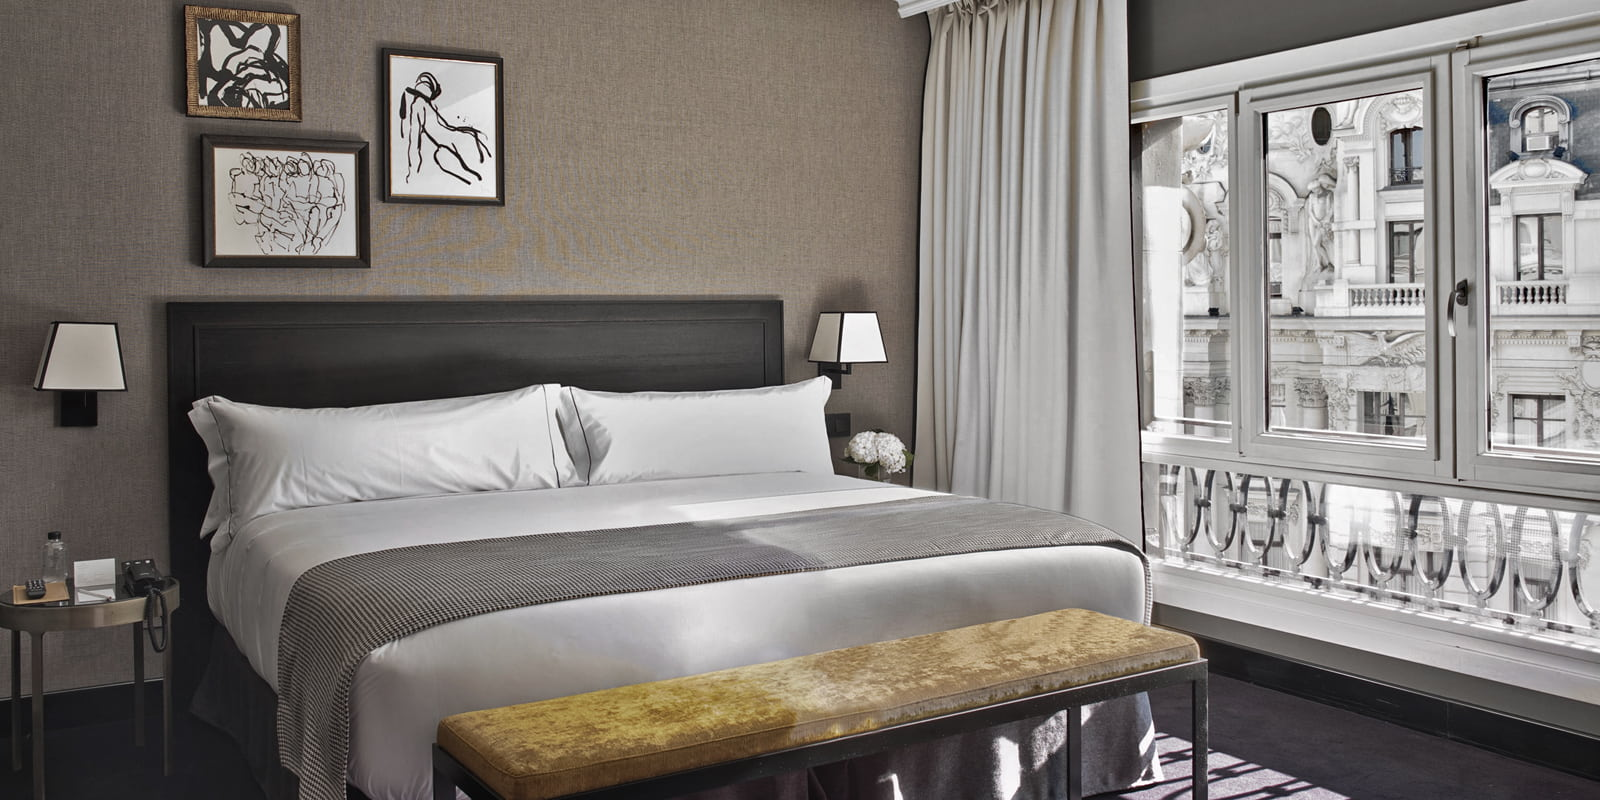 OCOA-TRAVEL-THE-PRINCIPAL-HOTEL-MADRID-9